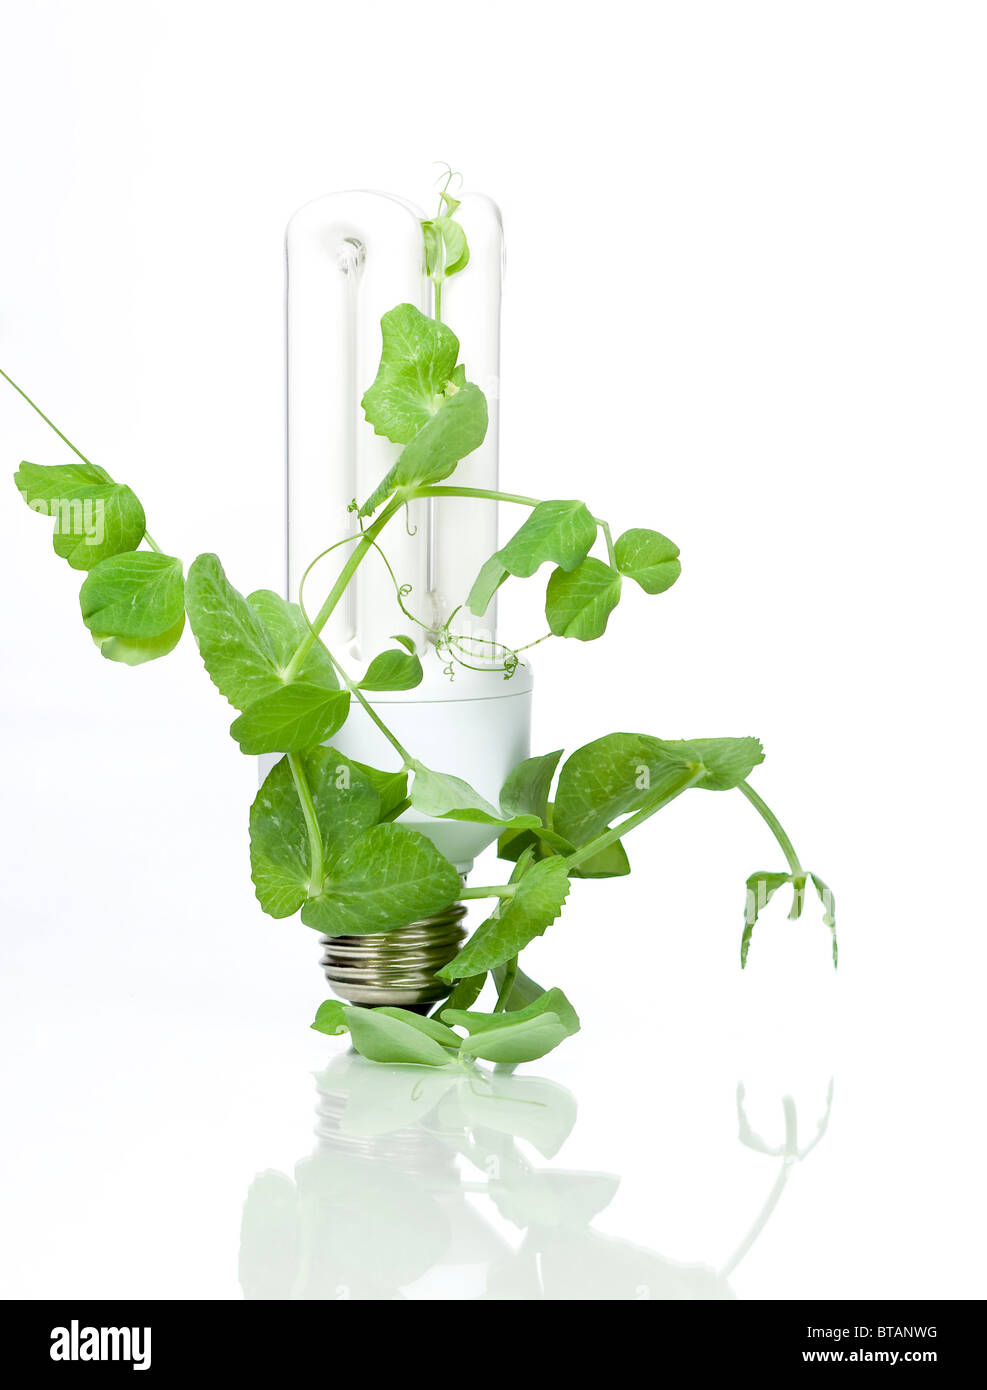 grüne Energie Stockbild